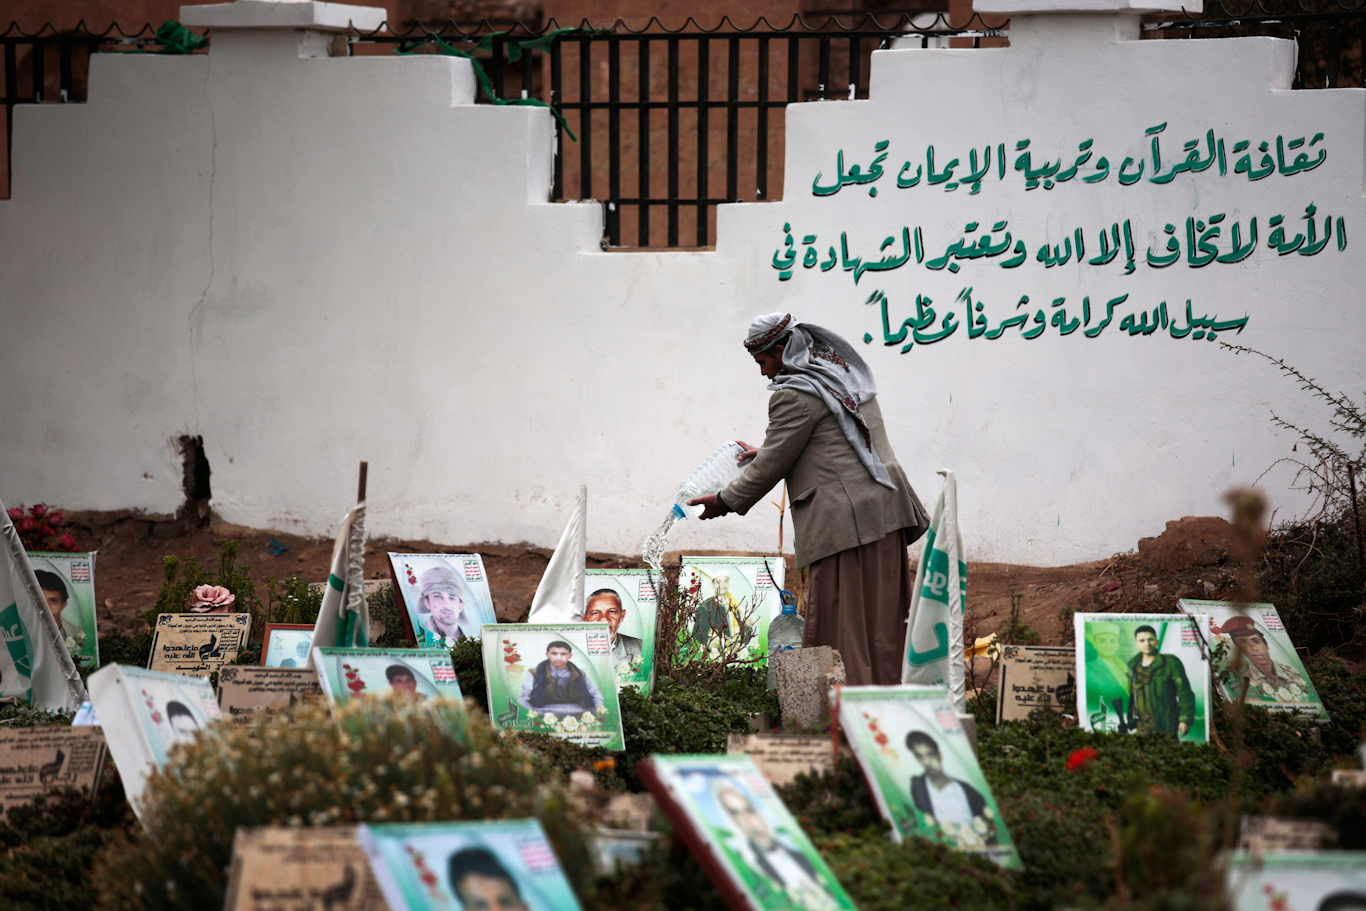 Yemen Martyr week